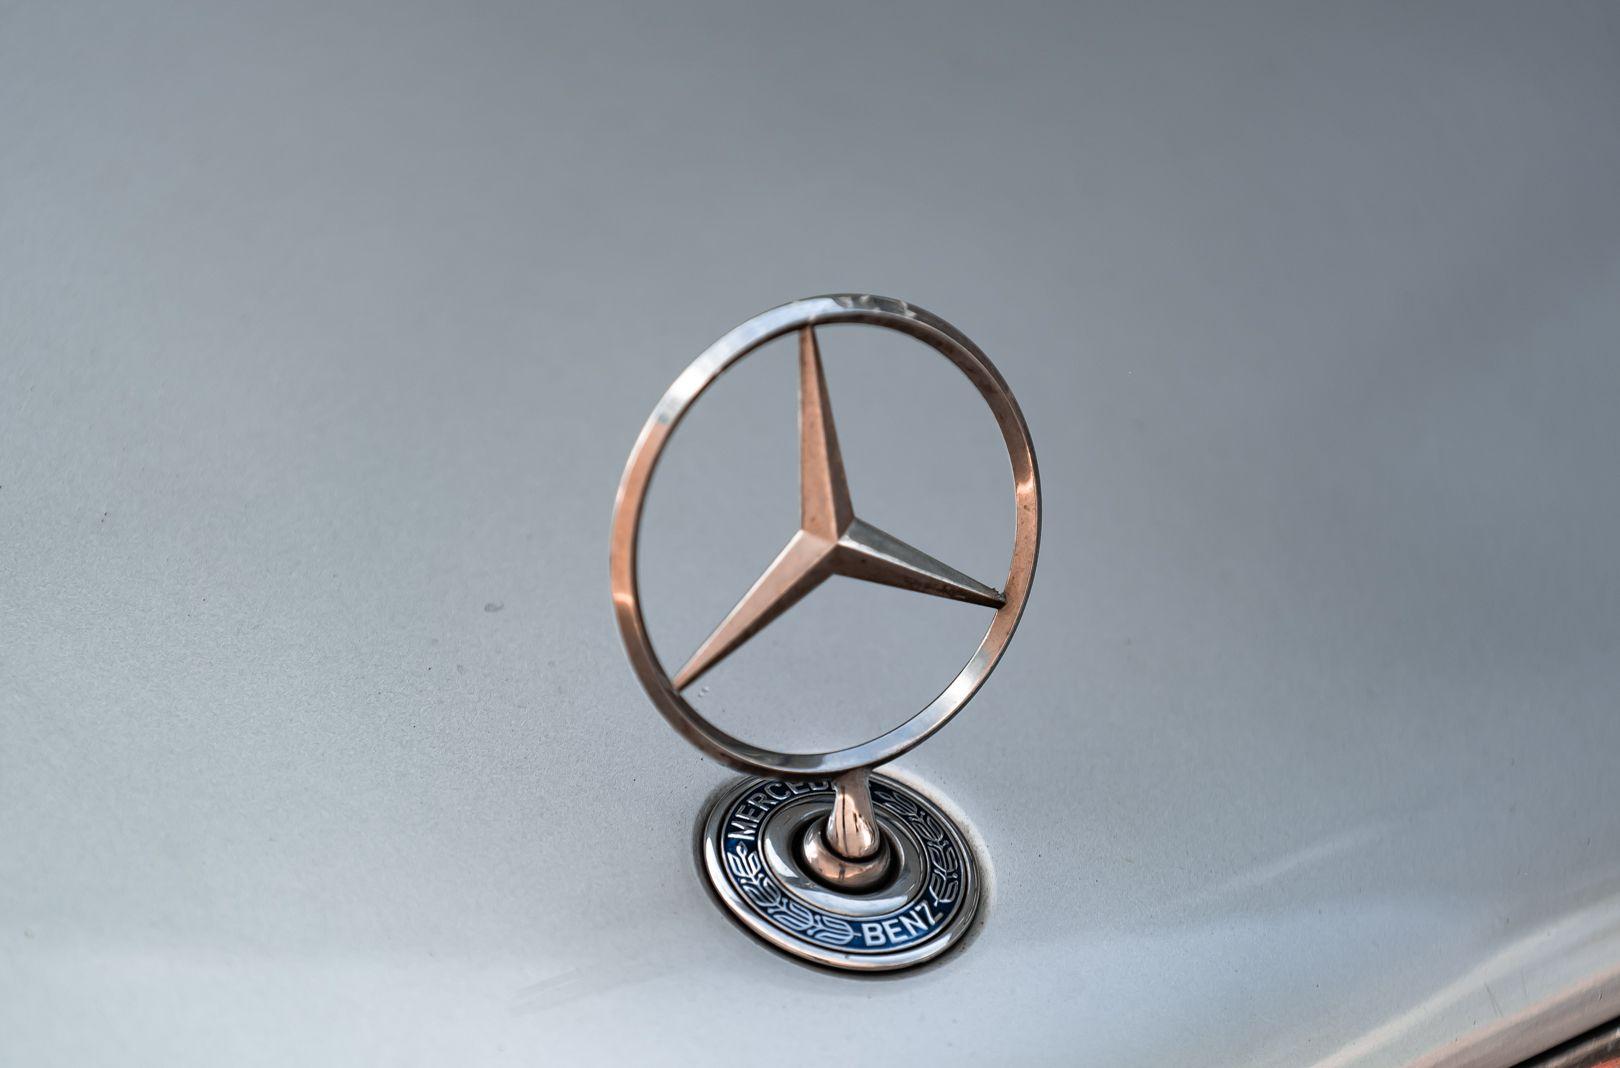 1995 Mercedes Benz C36 AMG 75809